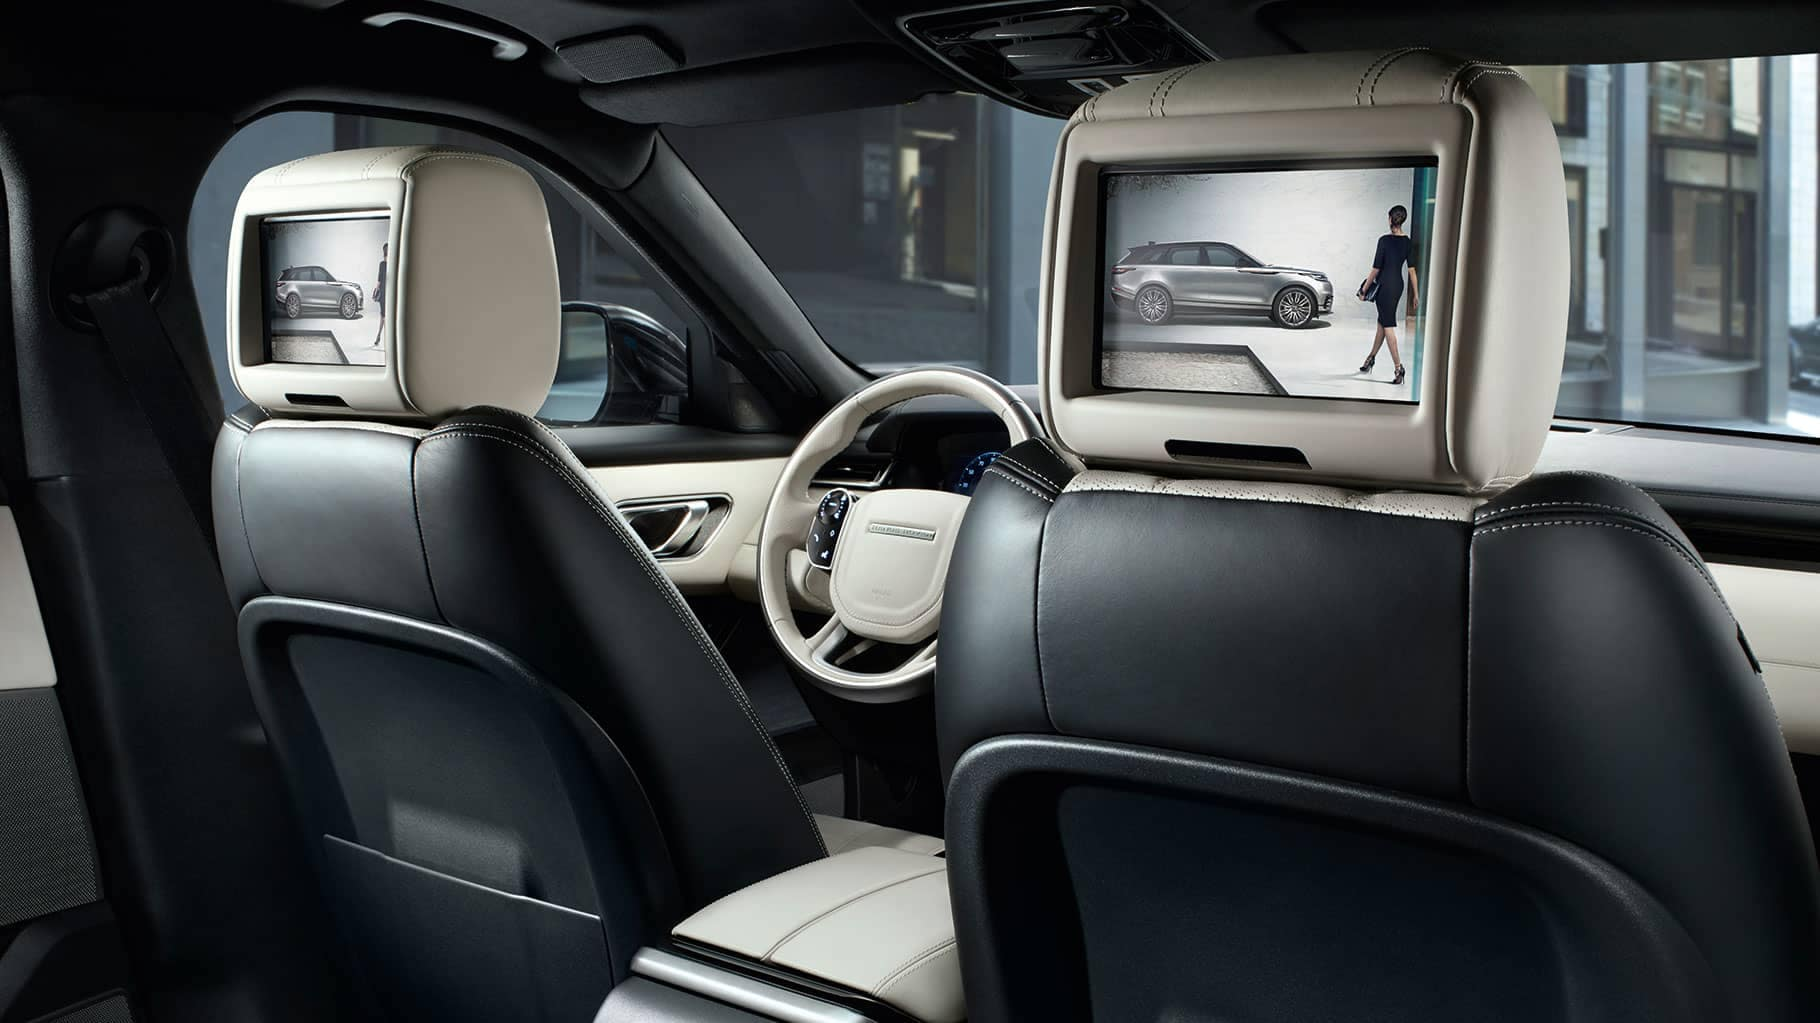 2019 Land Rover Range Rover Velar Rear Entertainment